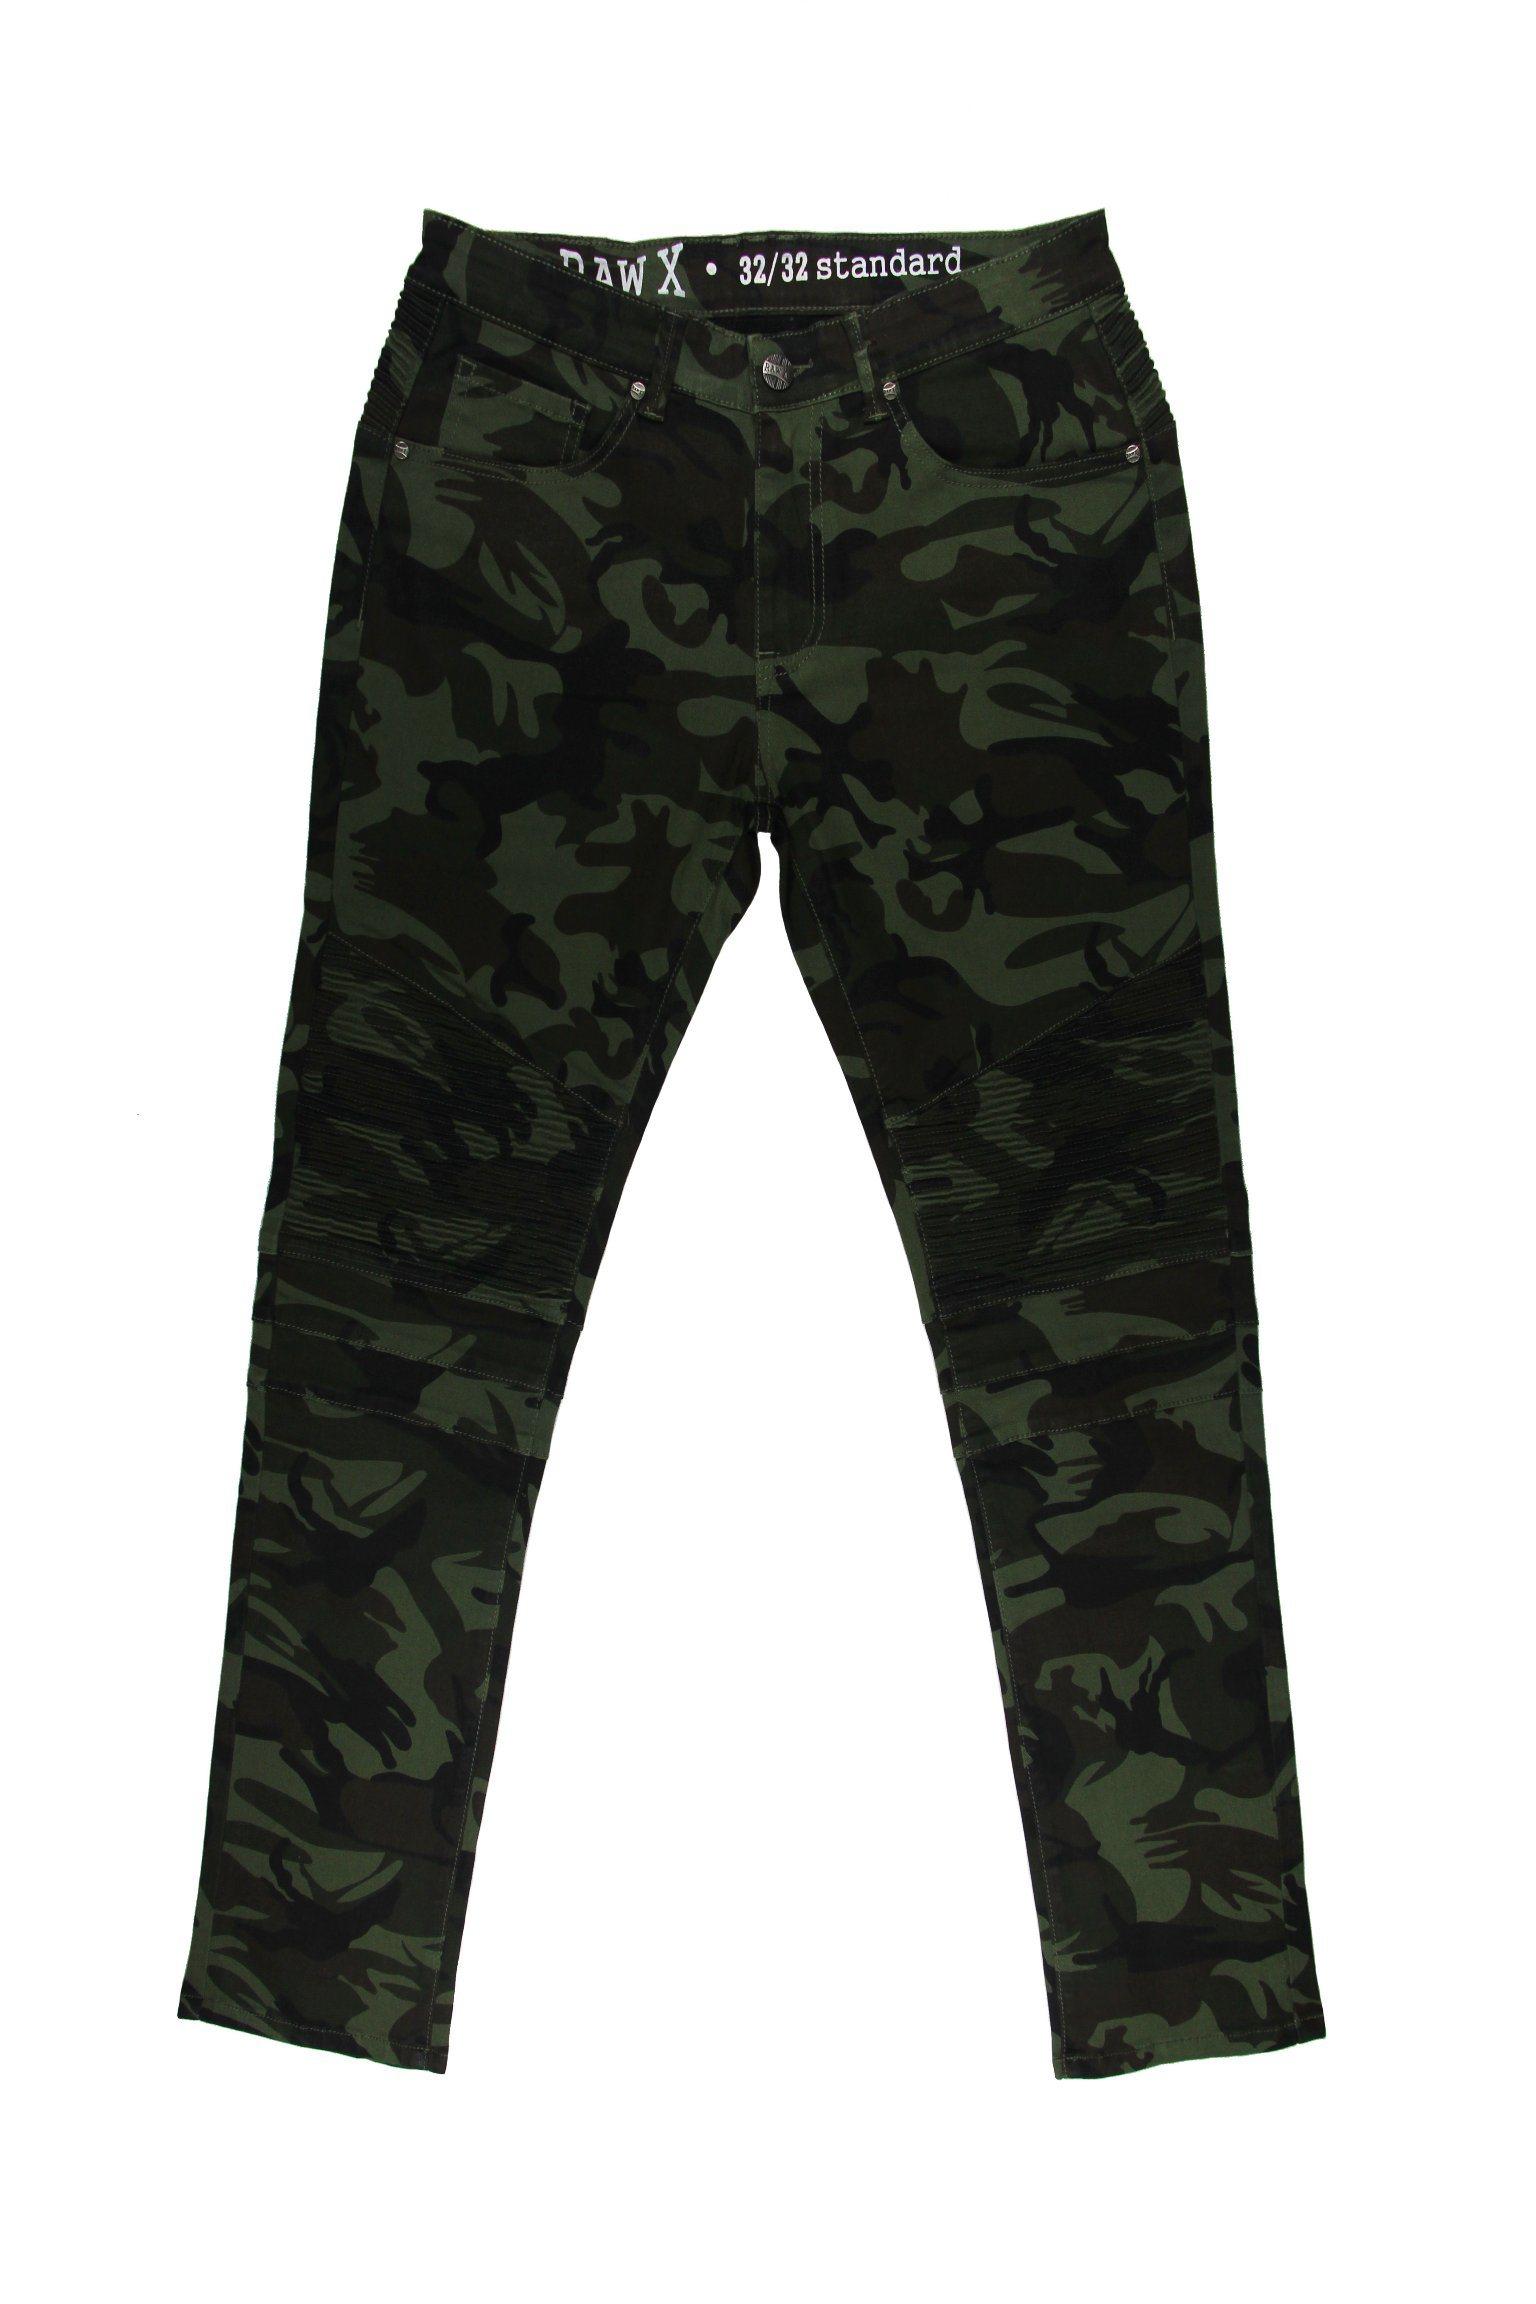 Popular Stylish Design Straight Leisure Men′s Pant (MYX18)